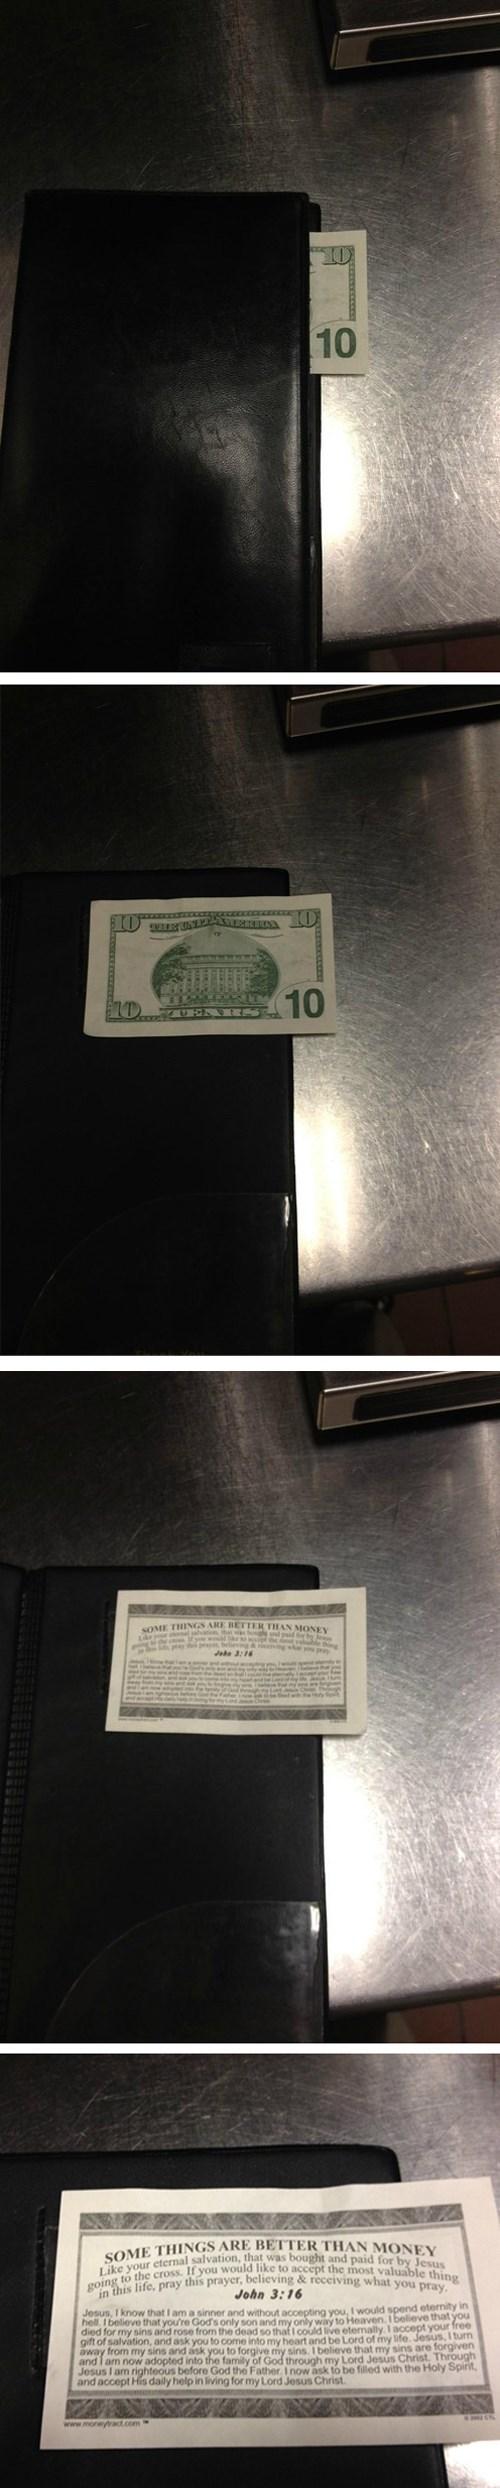 jesus waiters tips - 7898038016